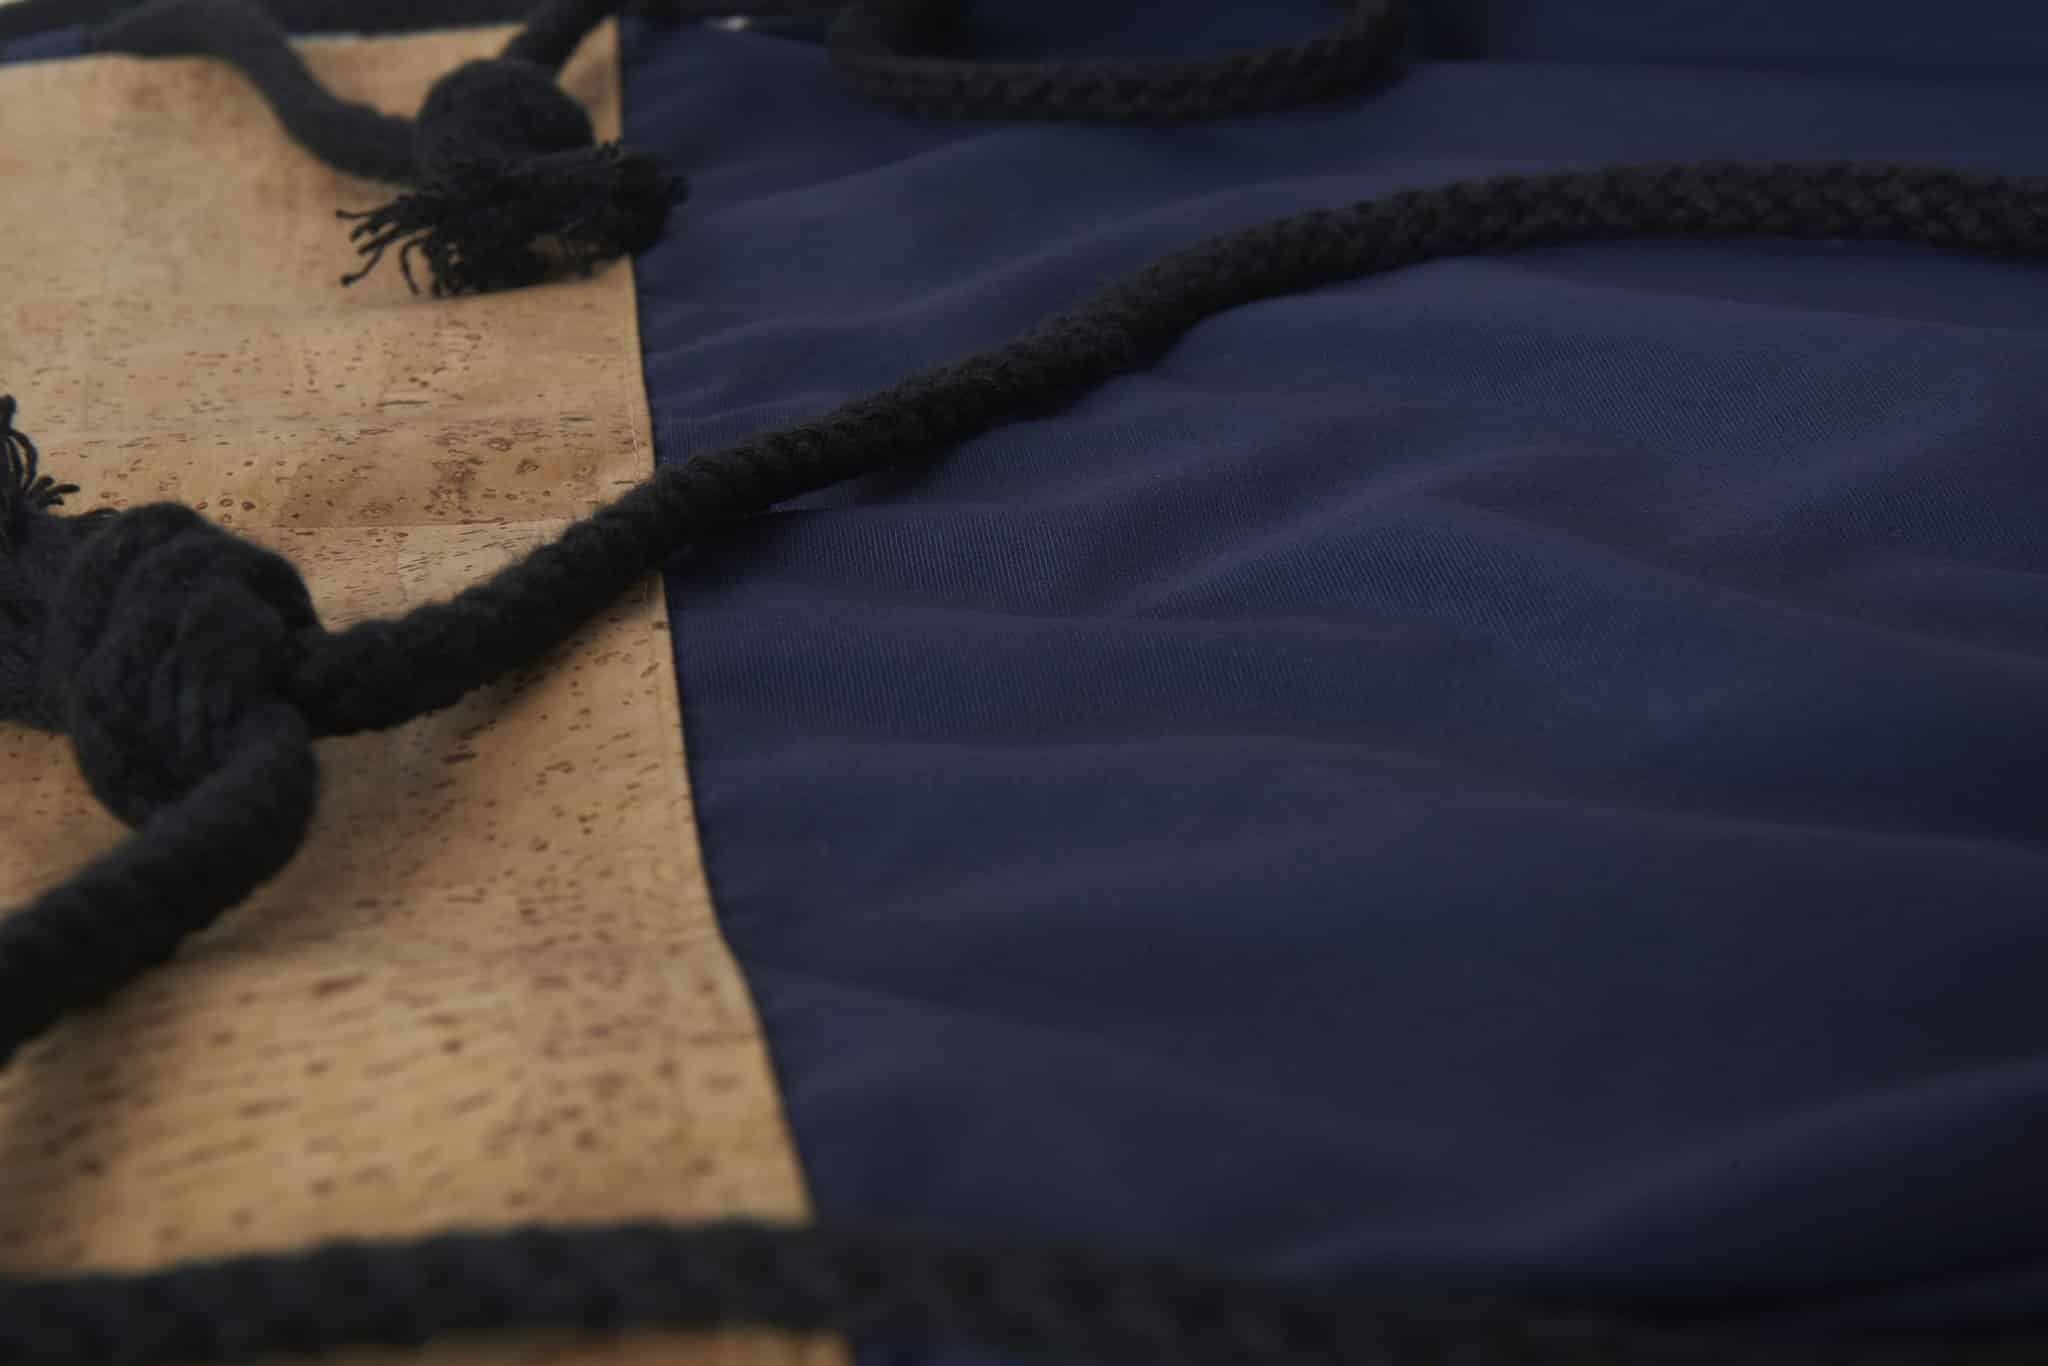 bolso mochila gimnasio moda complementos hombre mujer corcho basus hecho a mano francia